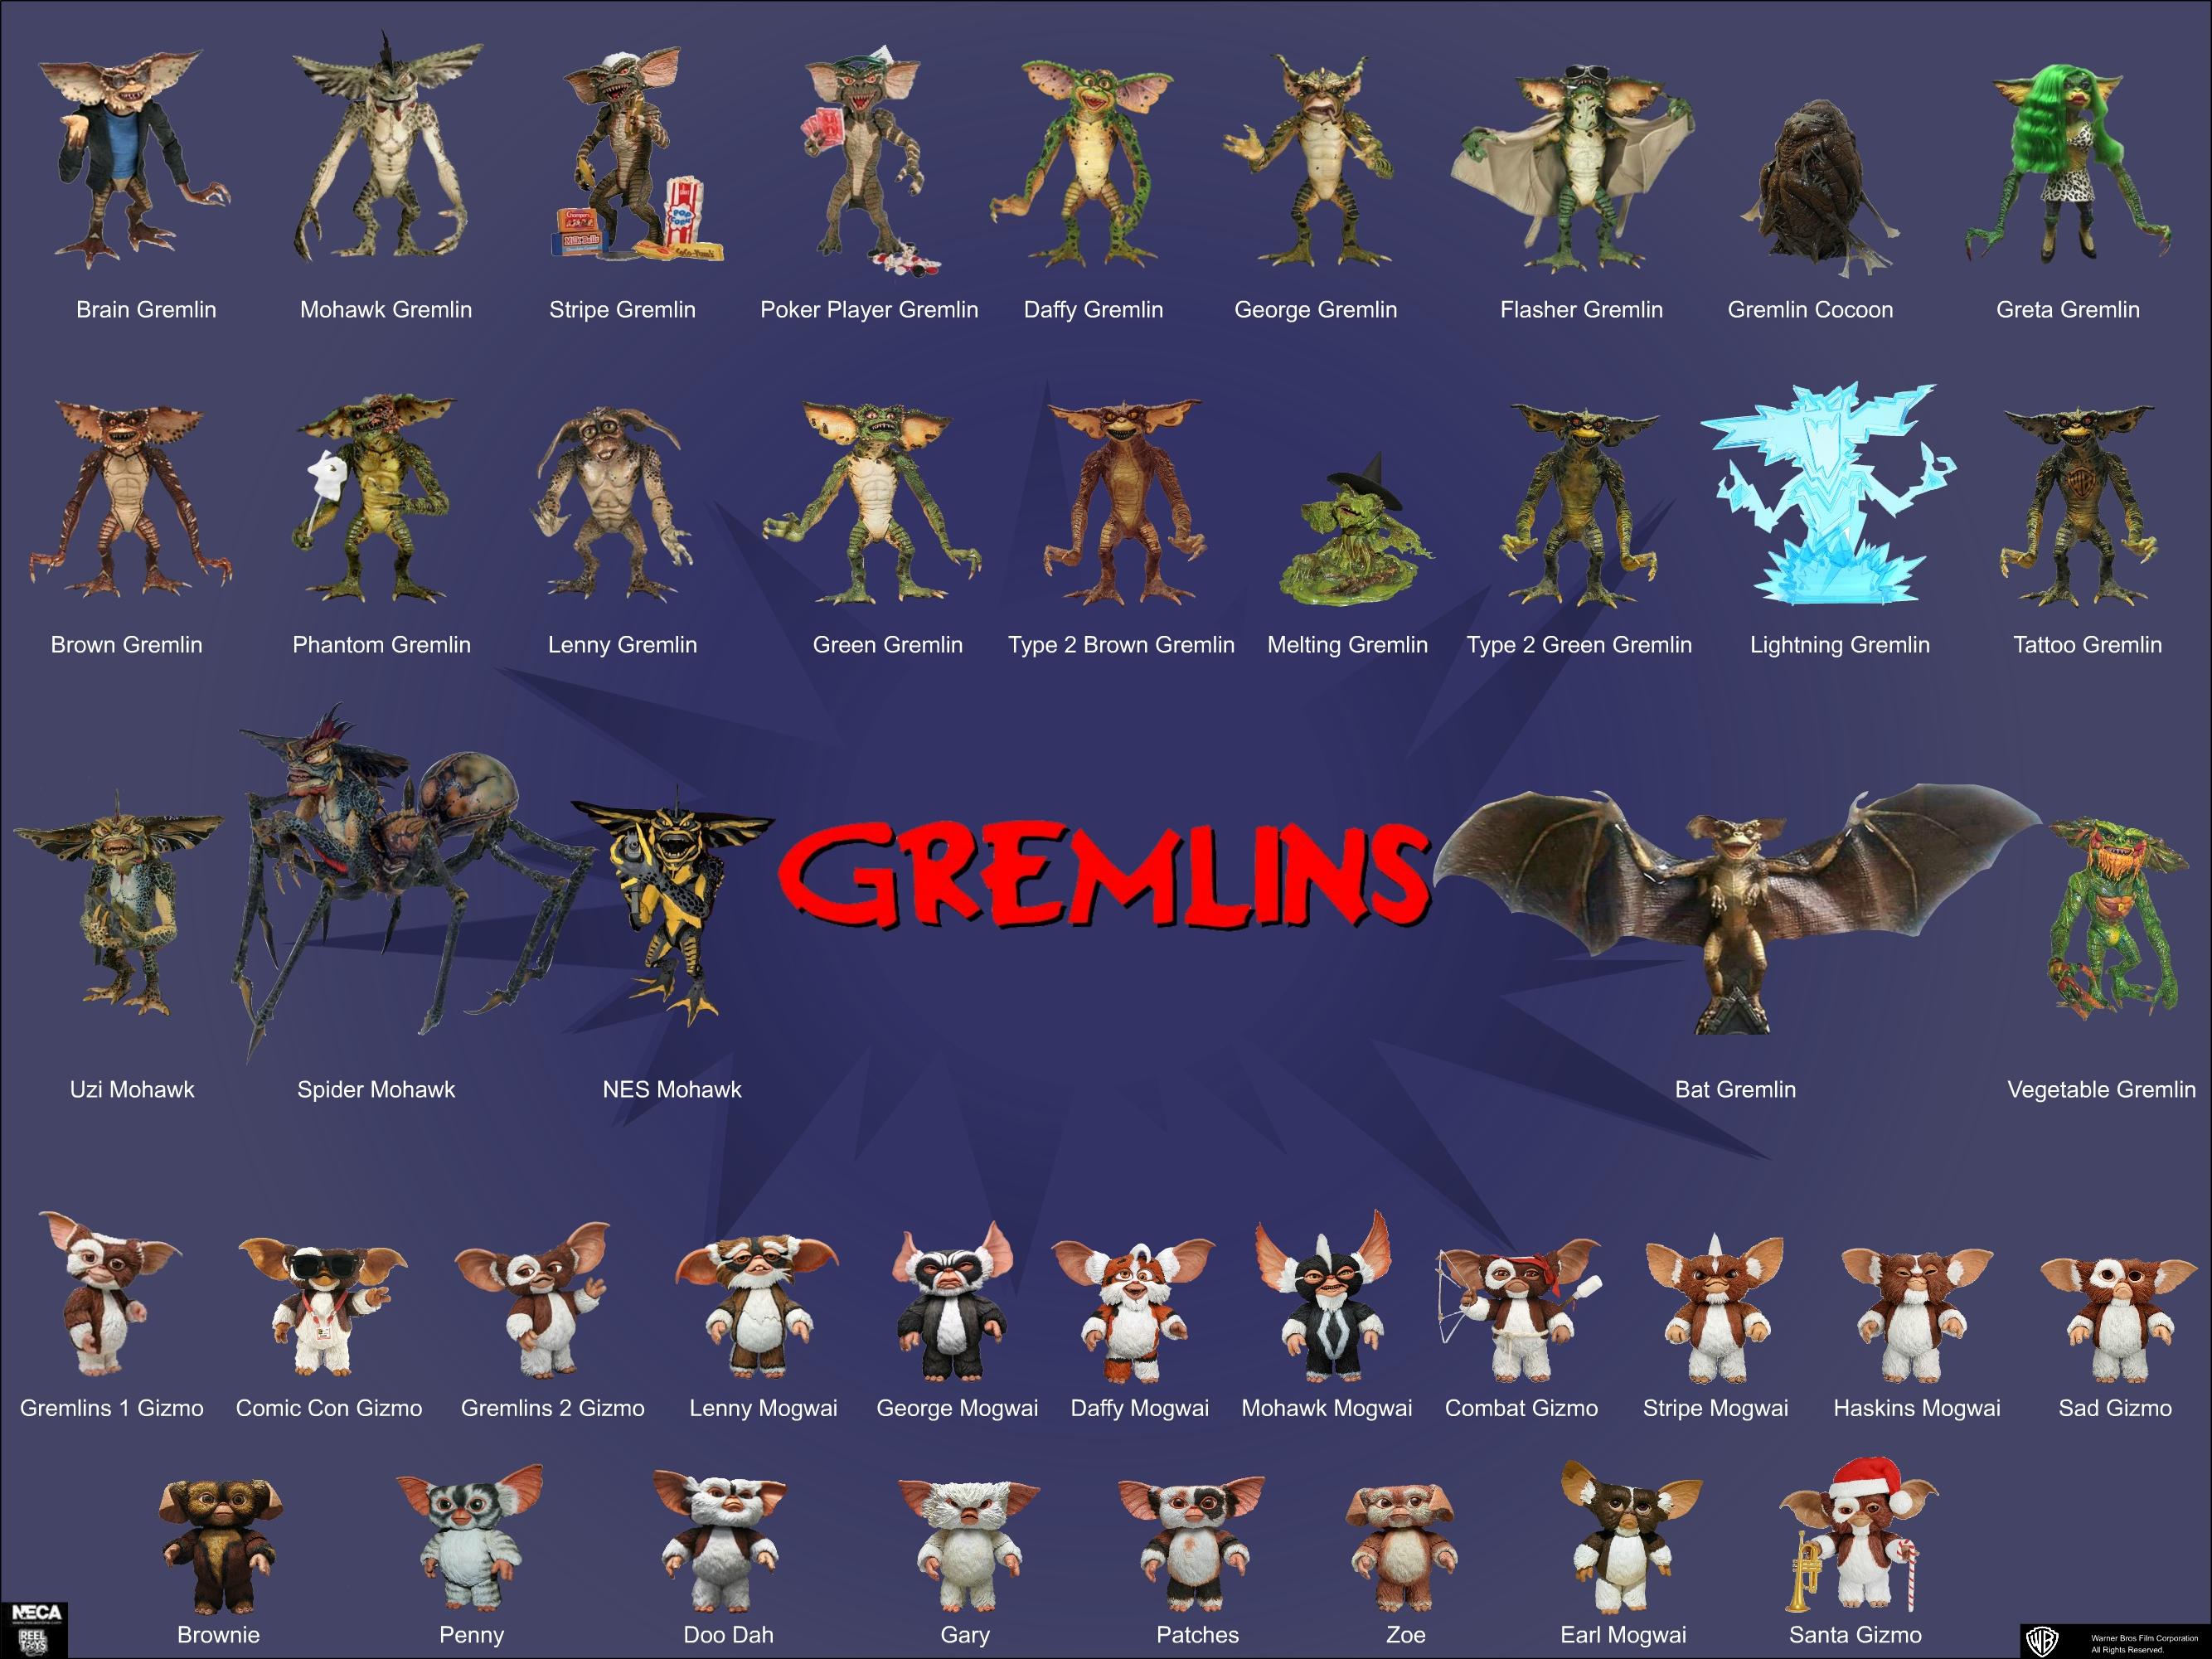 NECA Gremlins 2 BAT GREMLIN figure review - YouTube